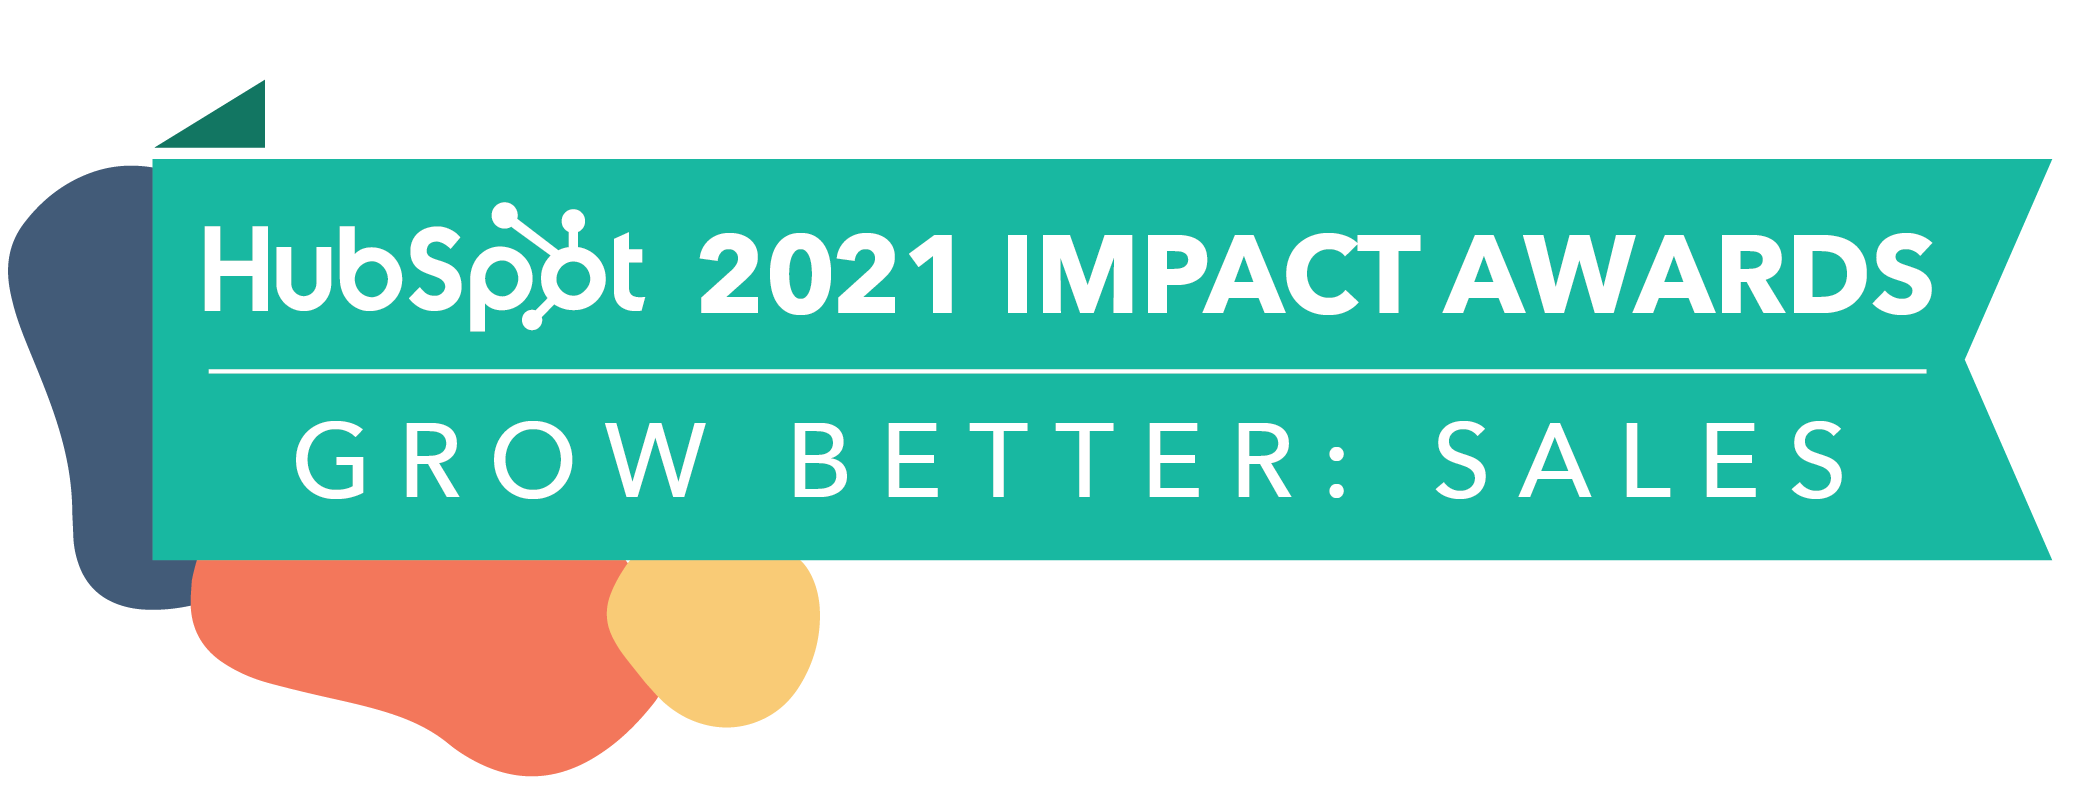 Hubspot Impact Awards Sales 2021 Q1